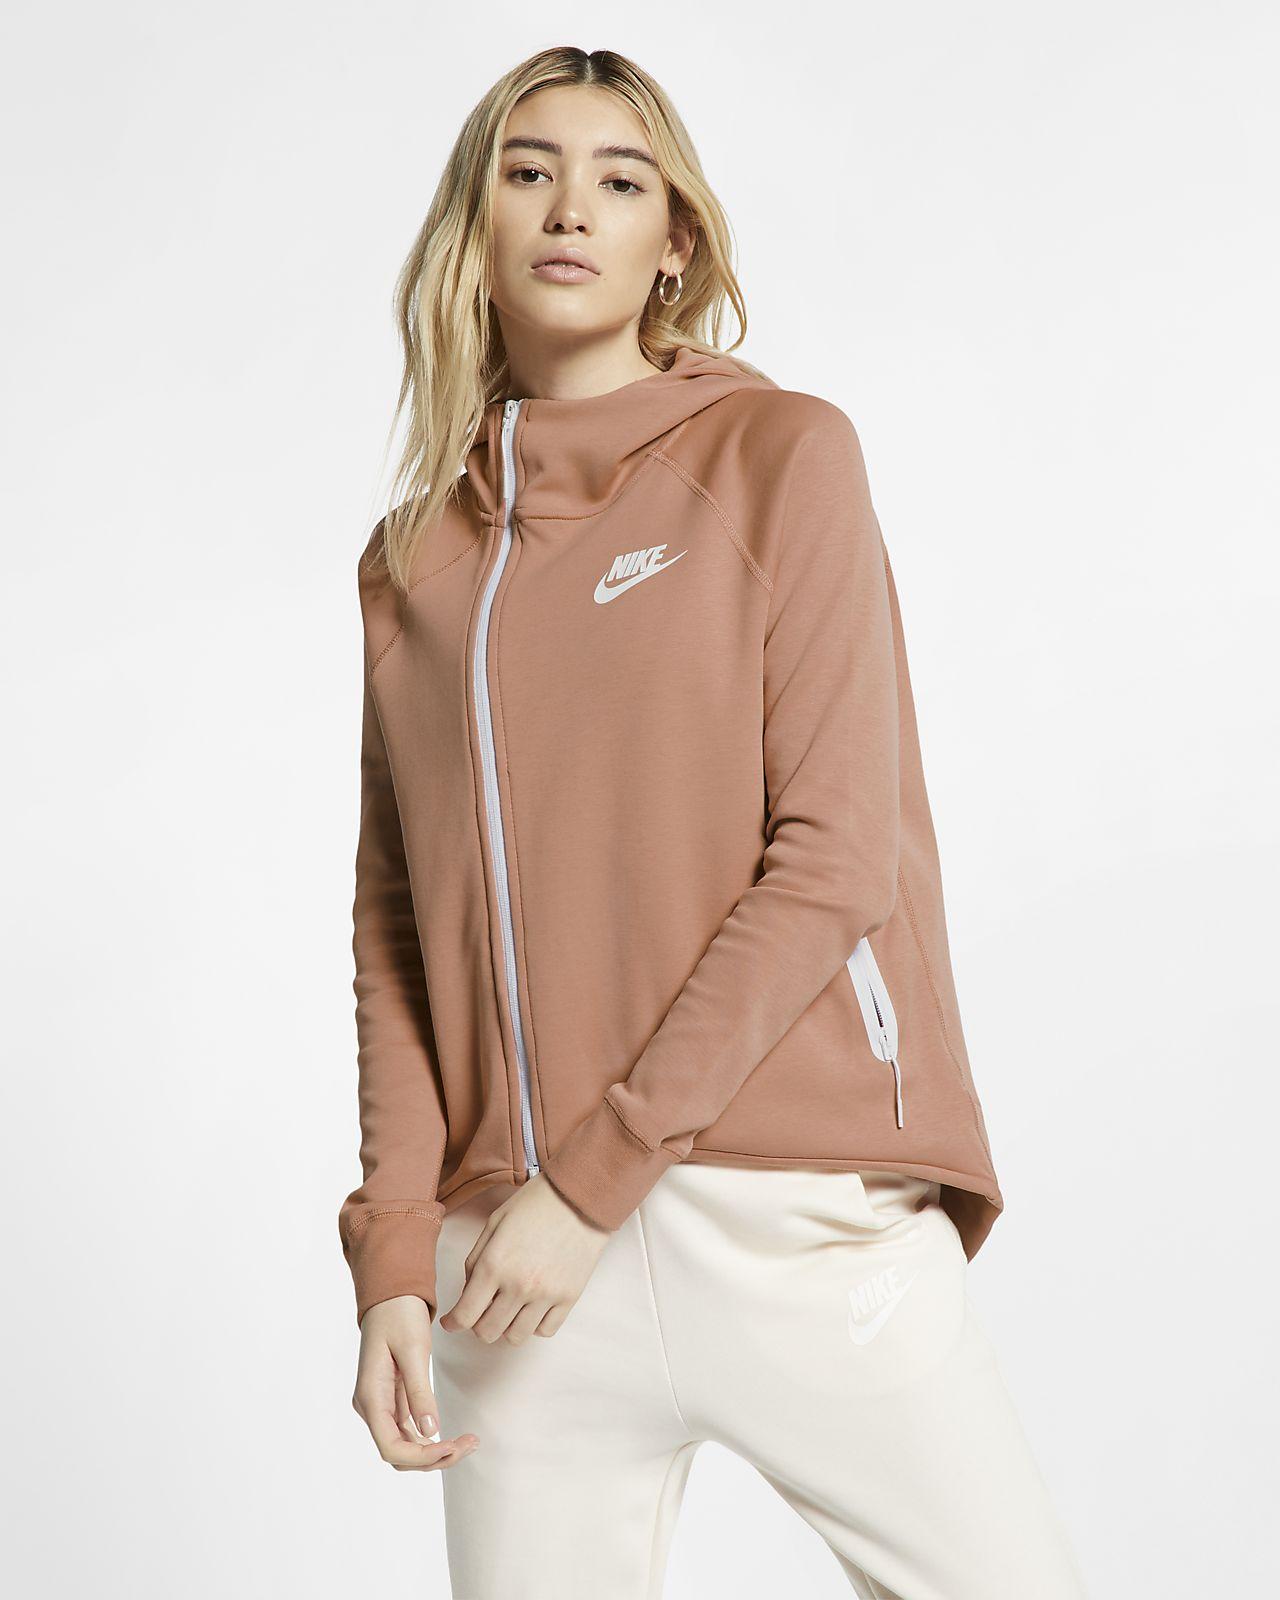 Nike Sportswear Tech Fleece Damen-Poncho mit durchgehendem Reißverschluss